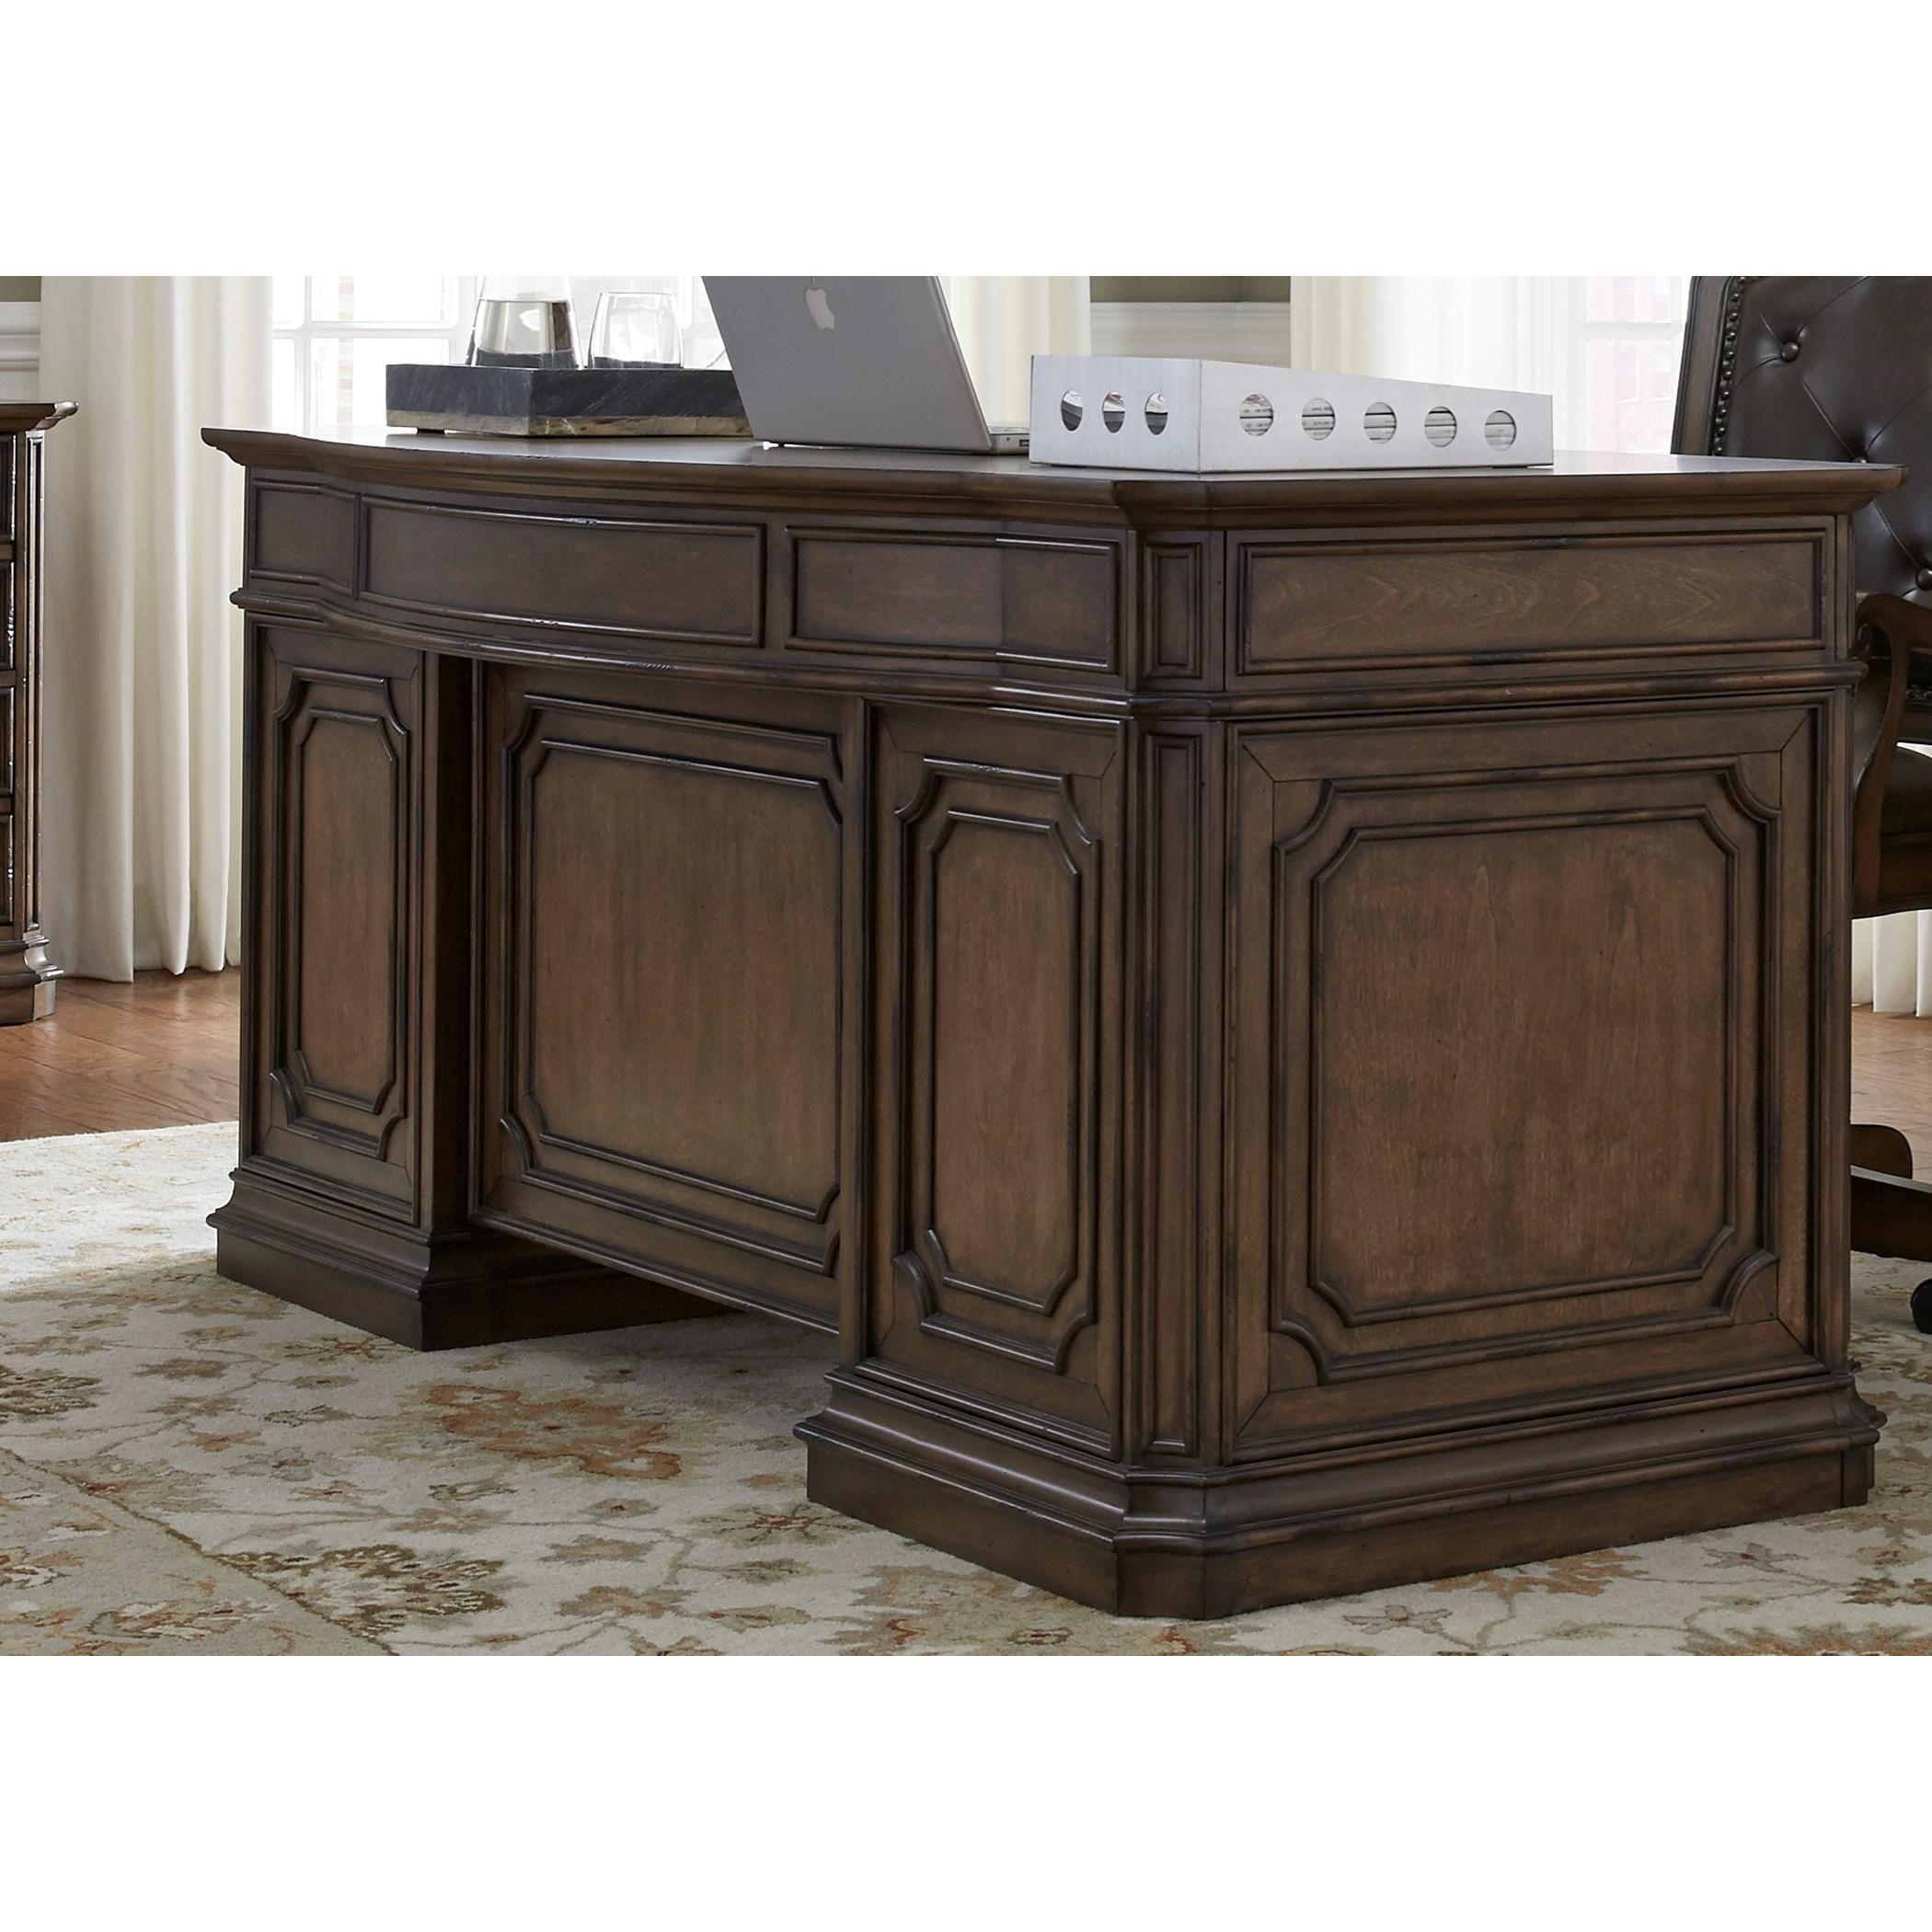 Ordinaire Royal Furniture